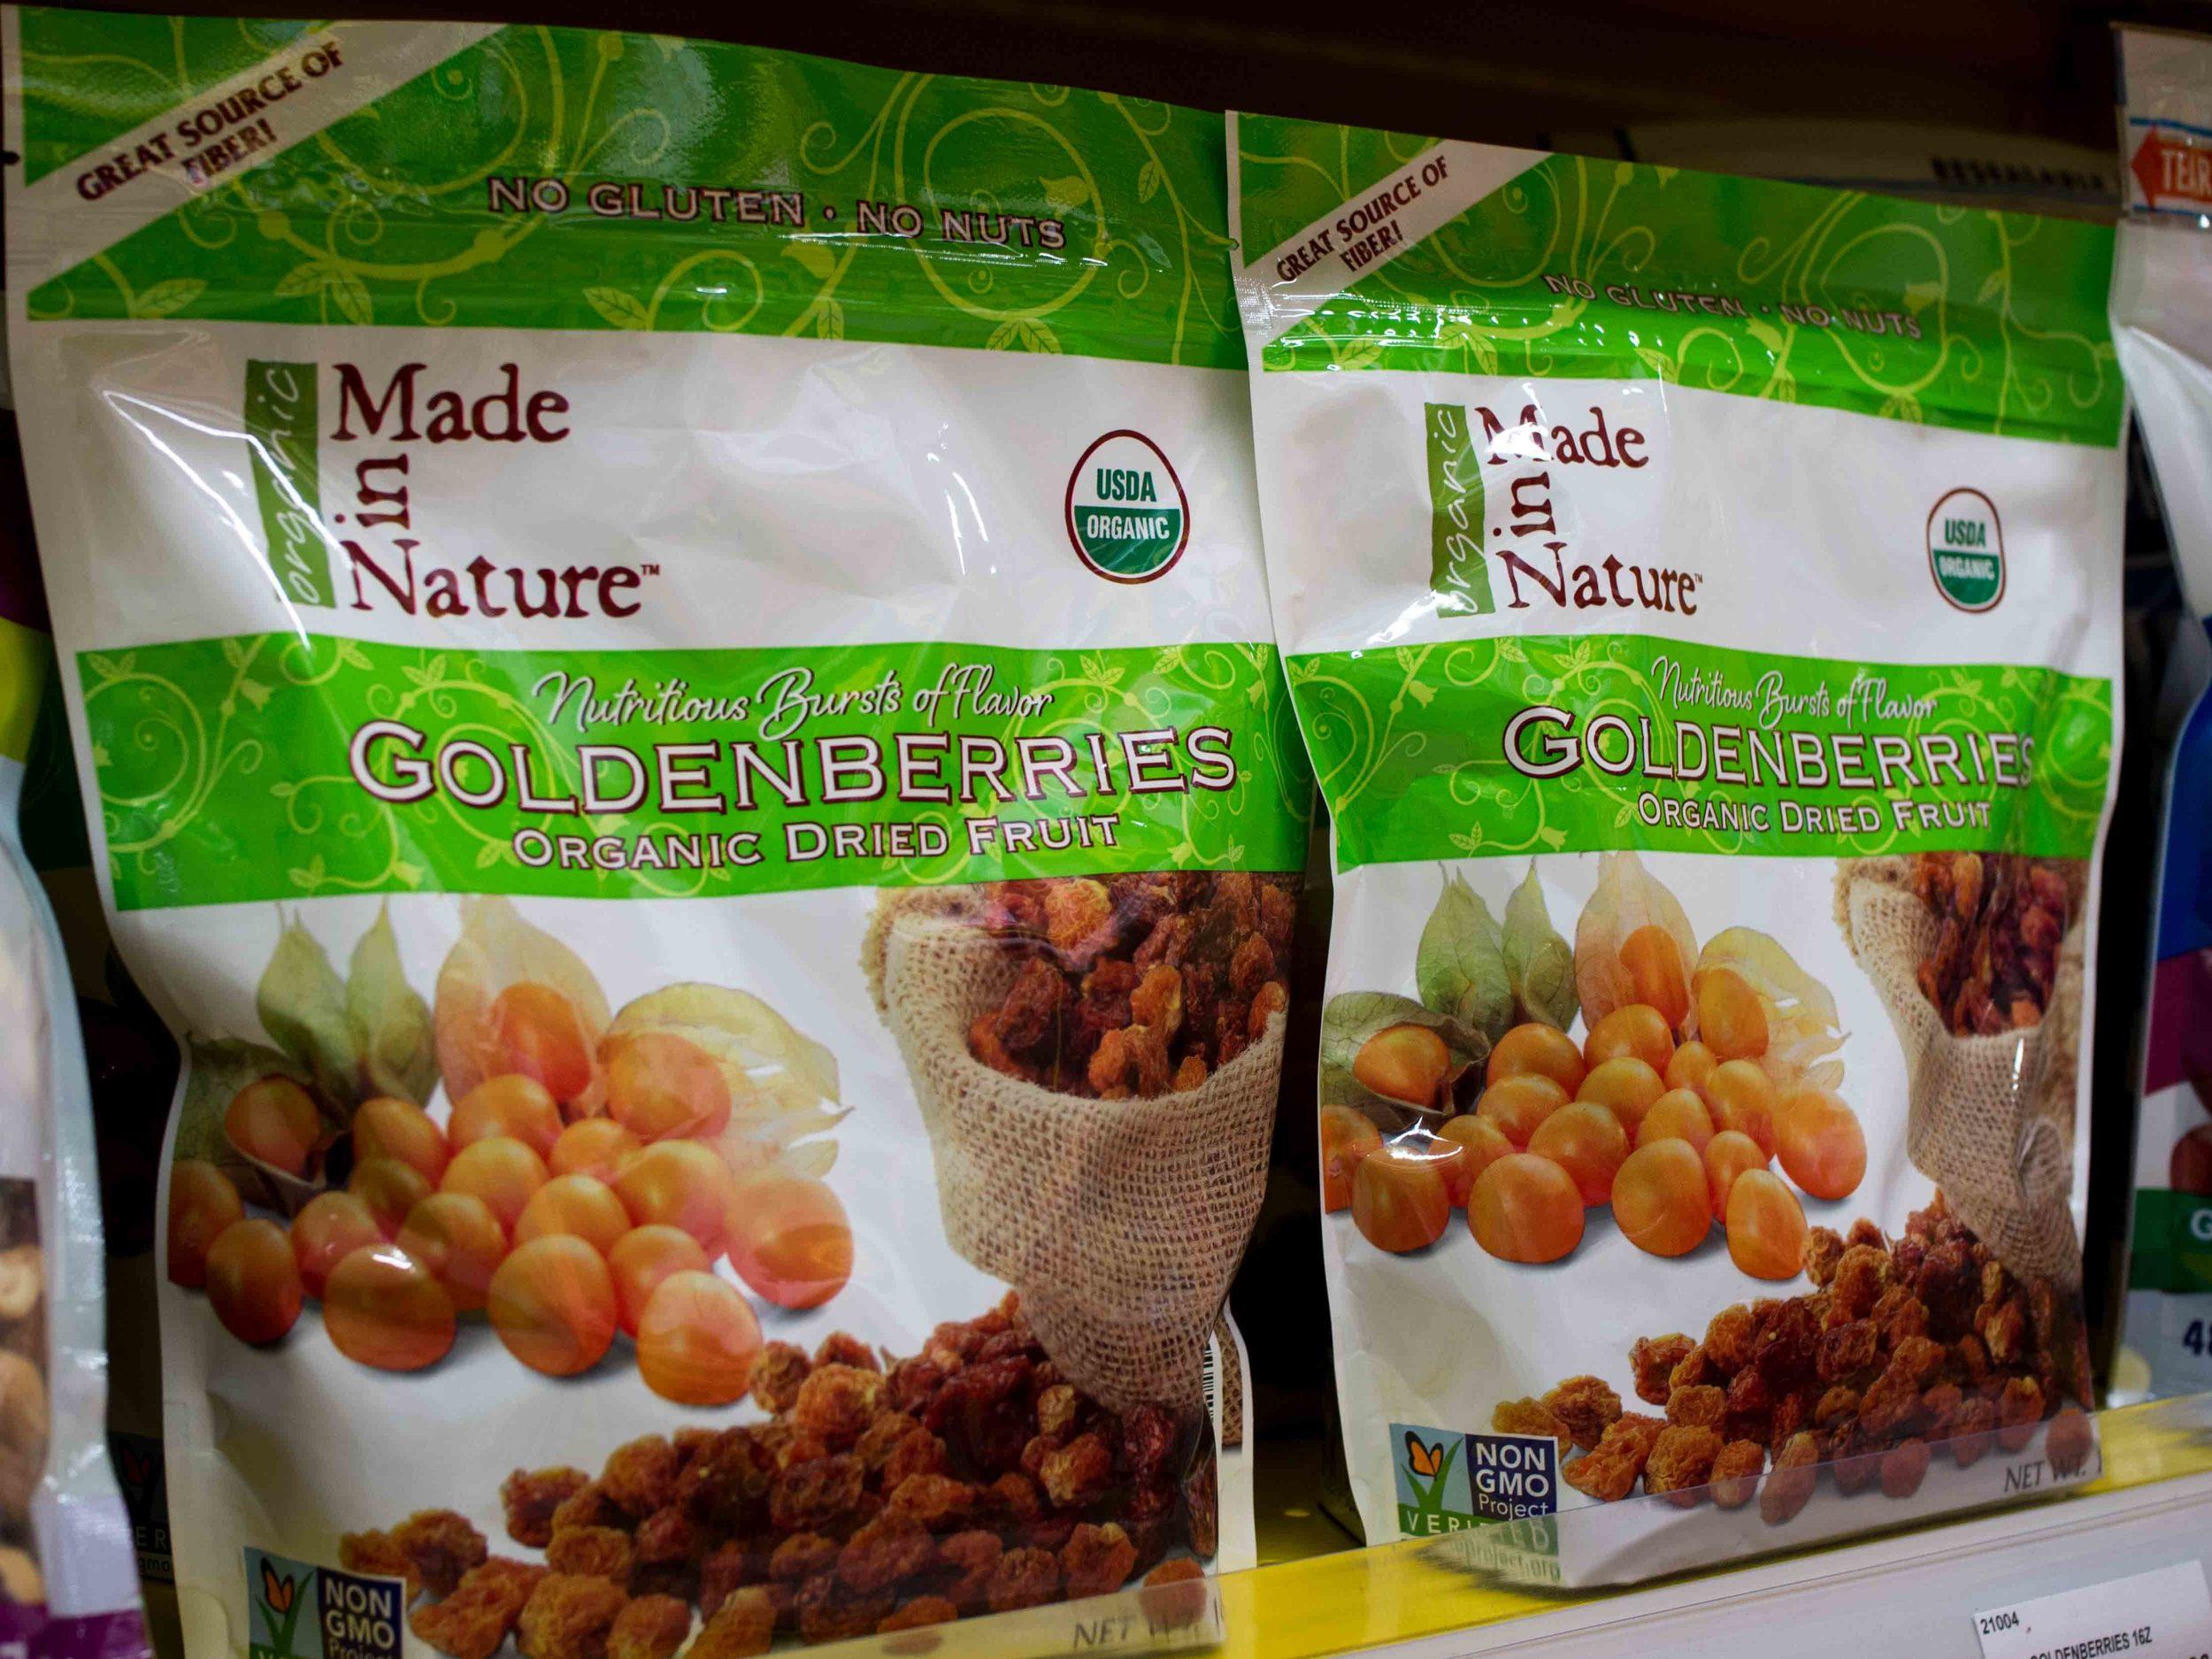 Made in Nature Golden Berries